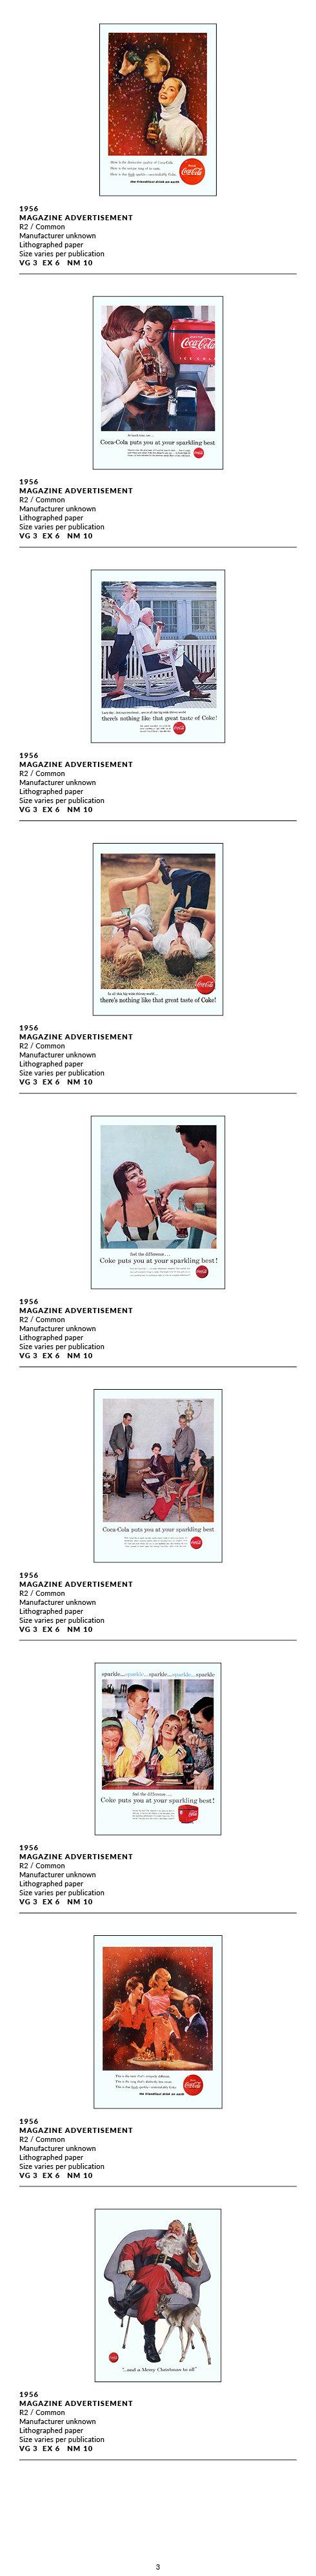 1955-59 Ads_3.jpg